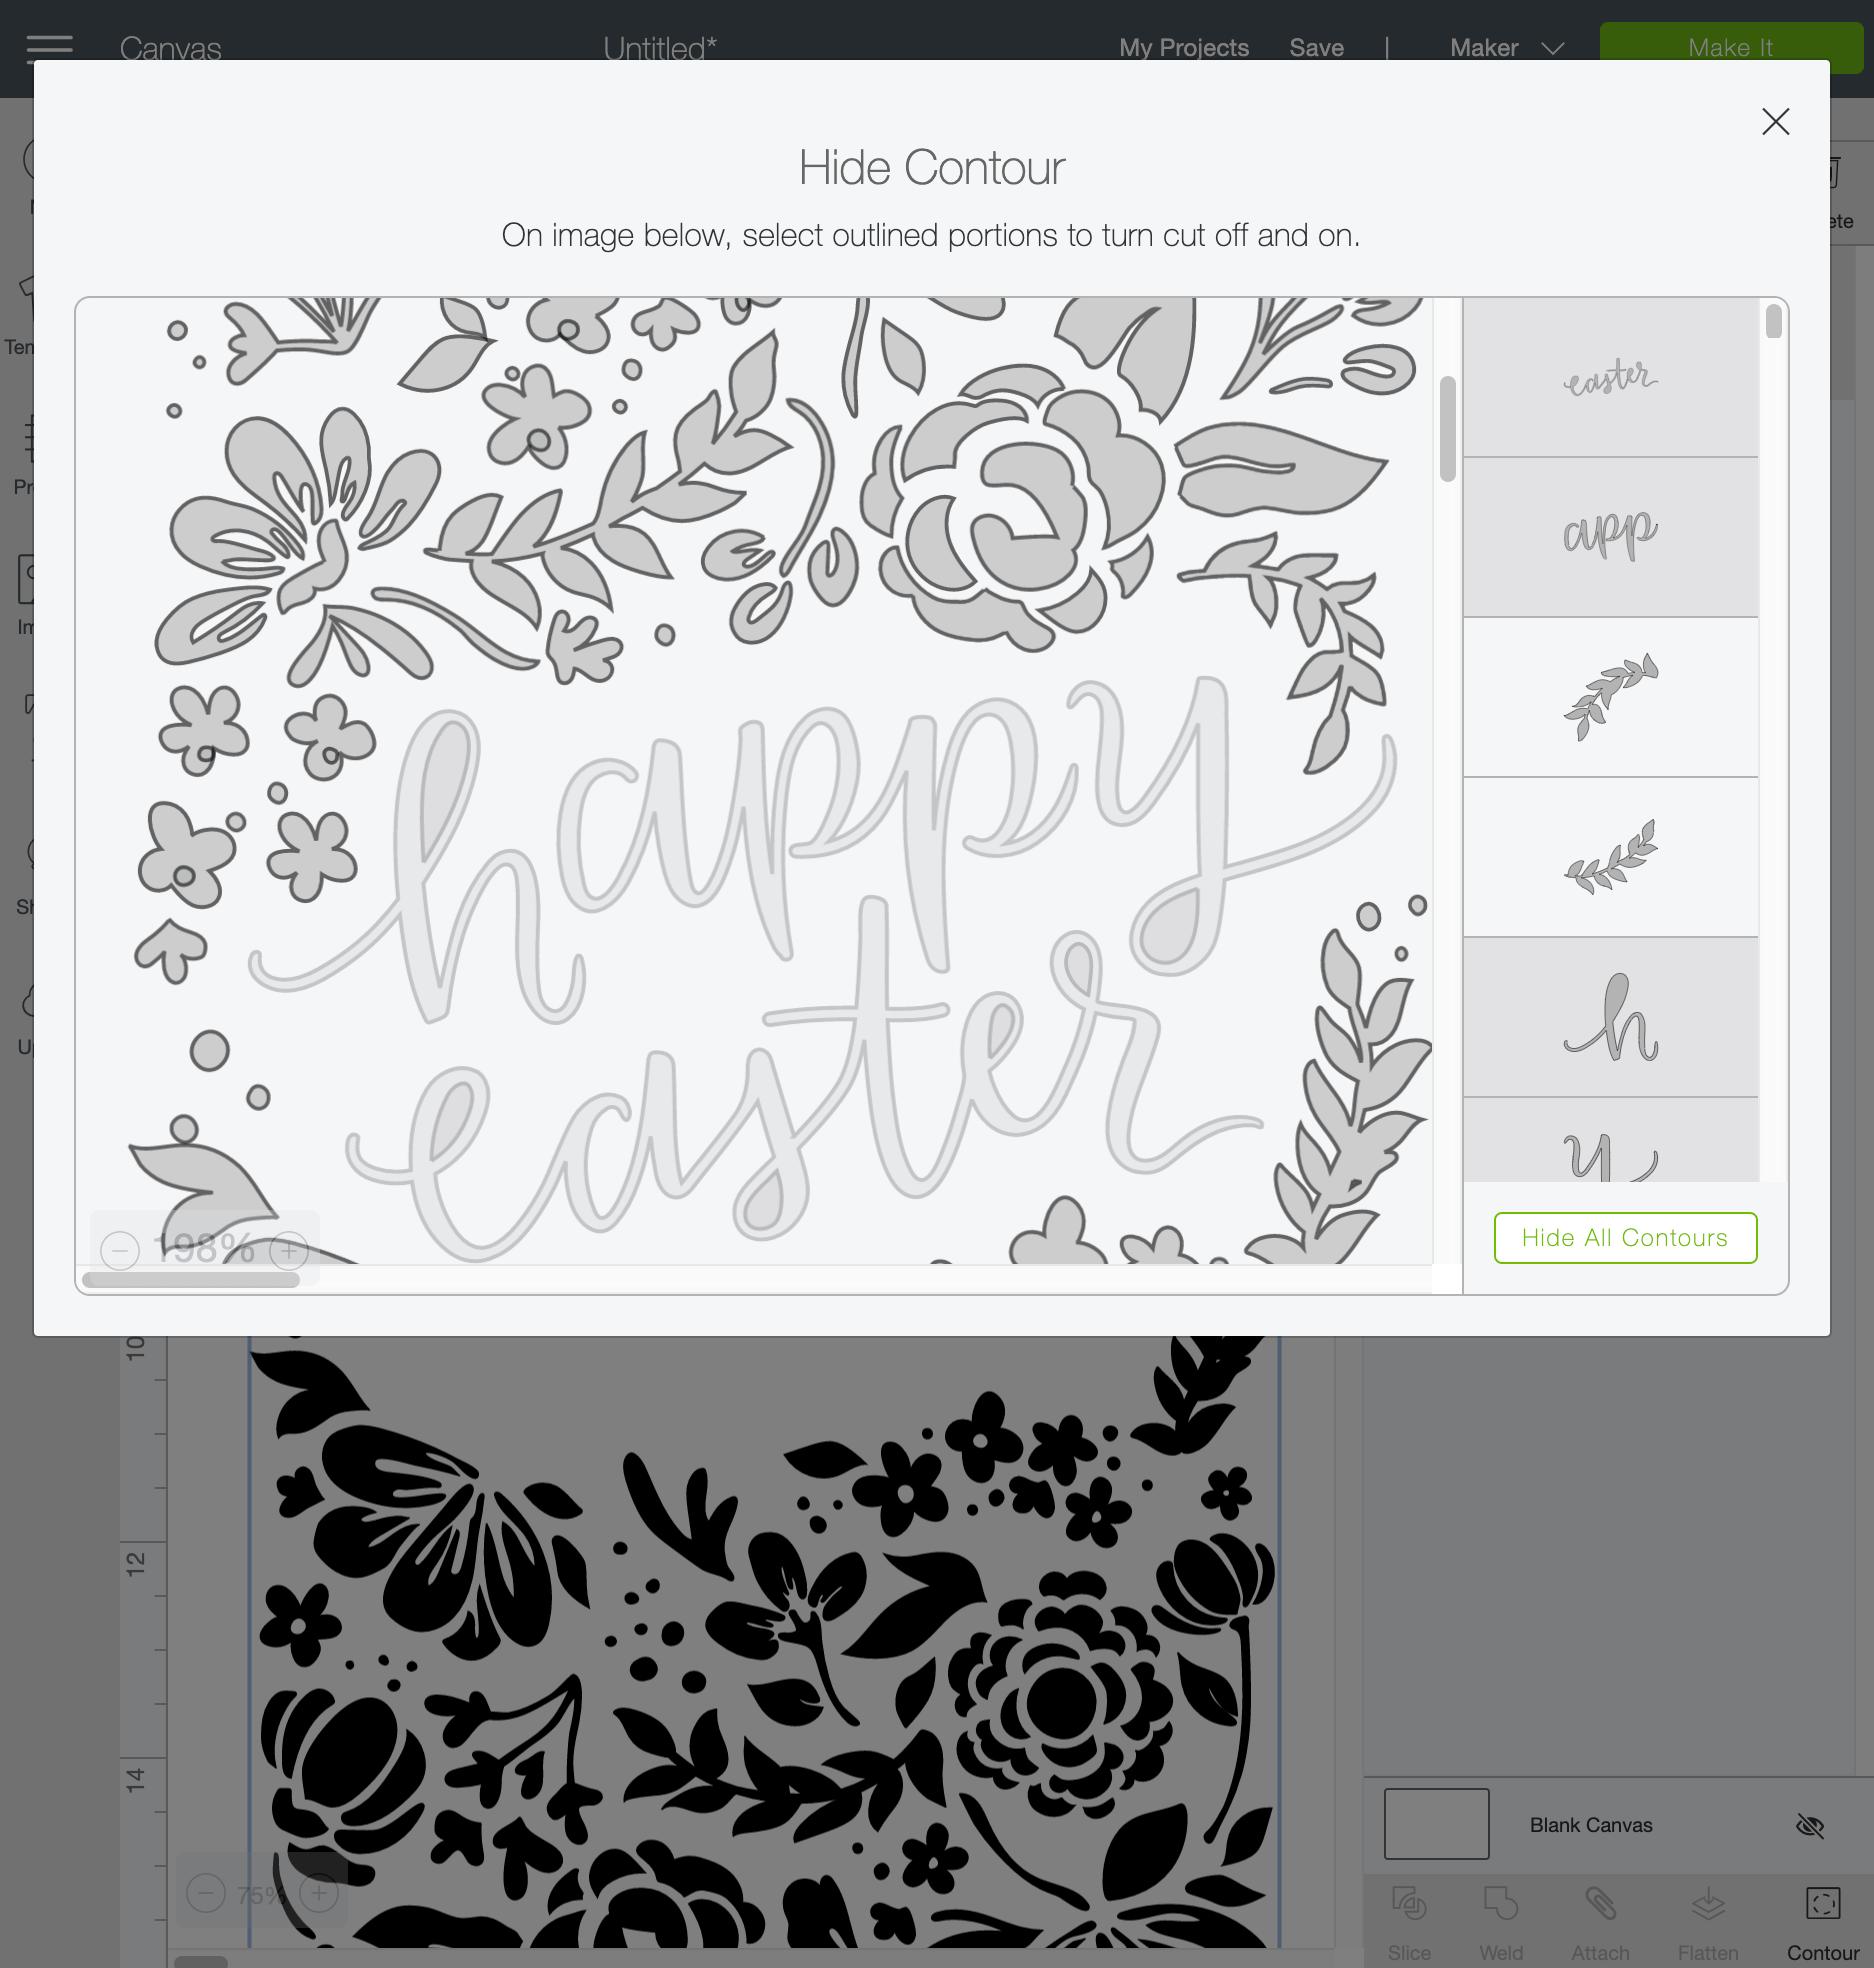 Screen shot in Cricut Design Space showing contour funtionality.